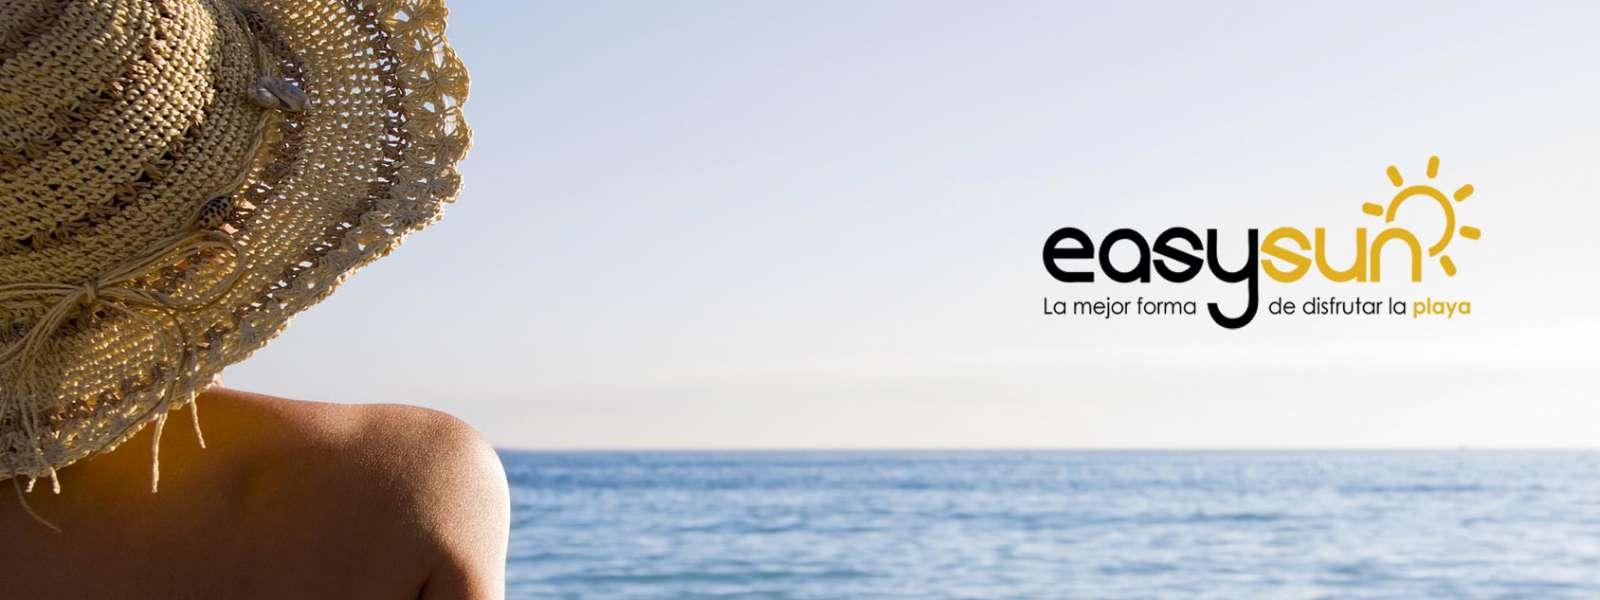 Hamacas | Beach Club Estrella del Mar